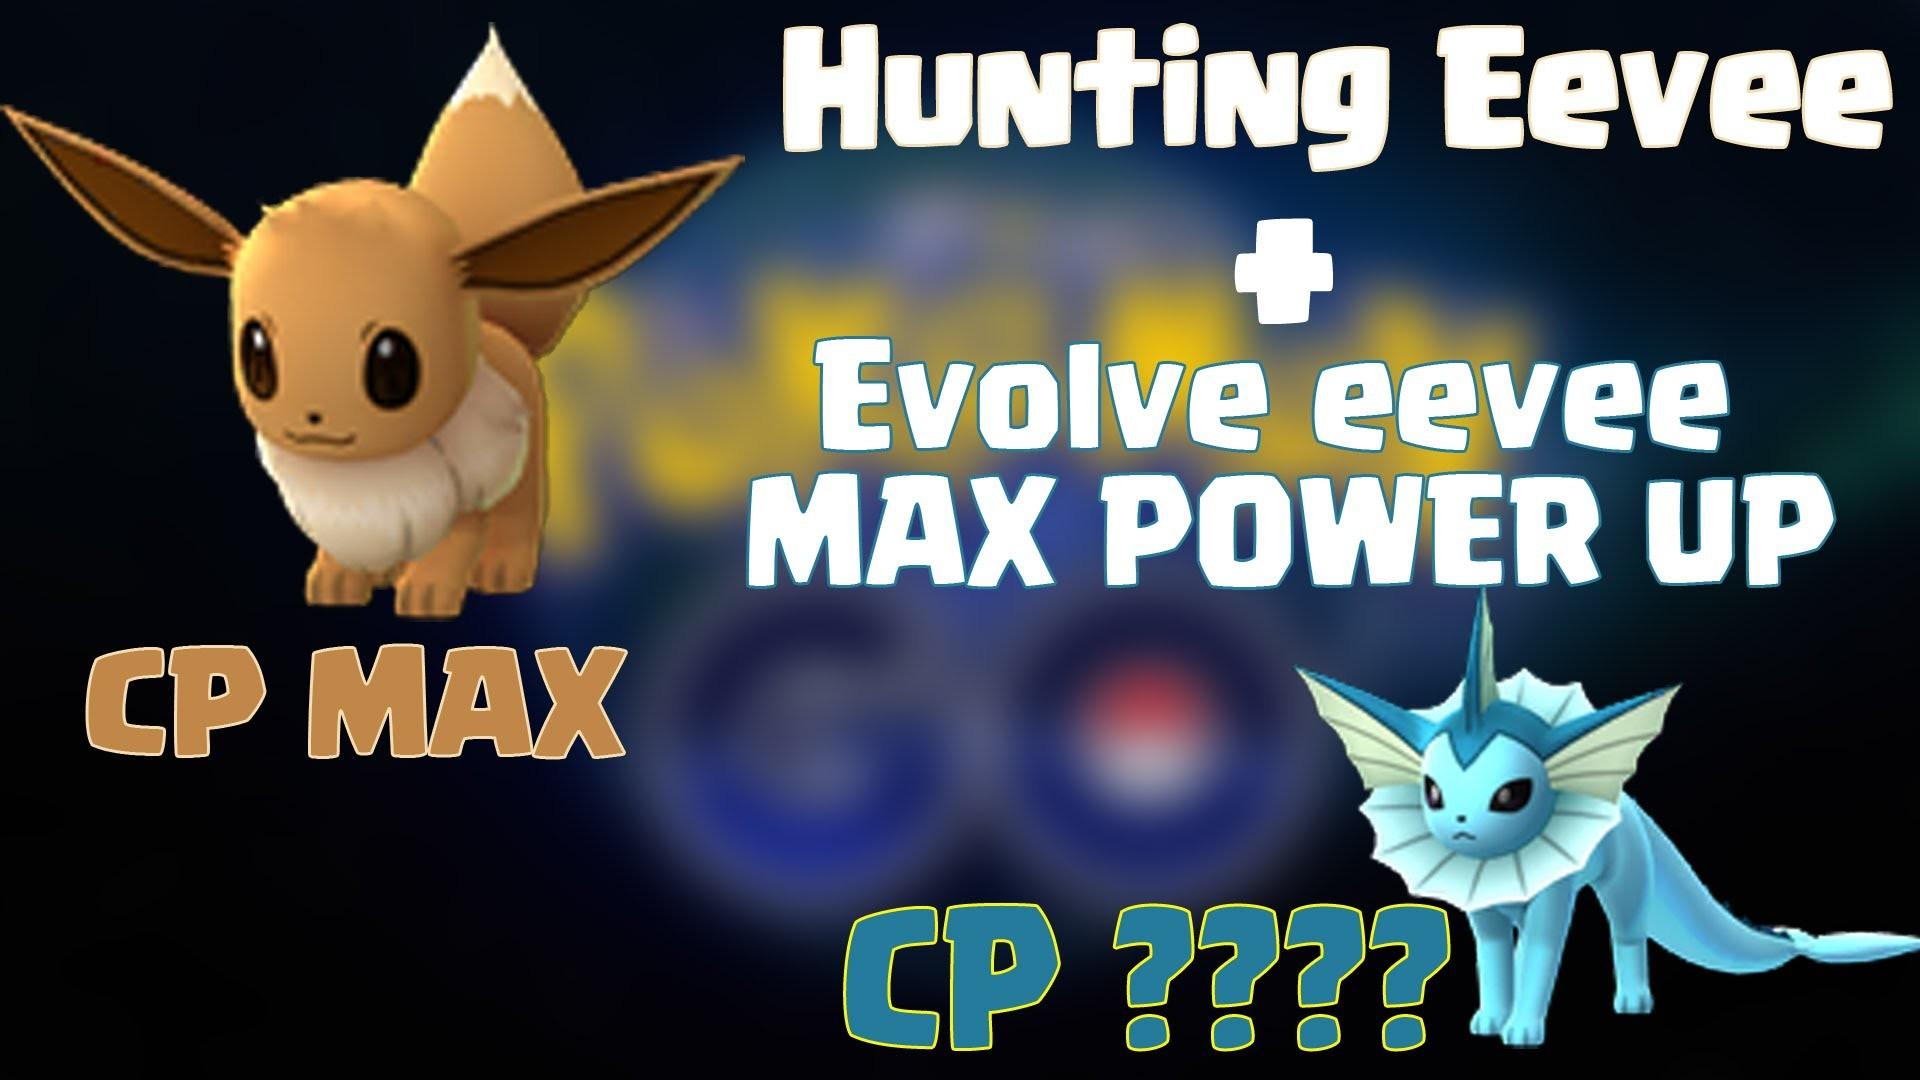 Main Pokemon Go di NOX – Hunting Eevee + Evolve eevee CP MAX | Pokemon Go  Indonesia – YouTube